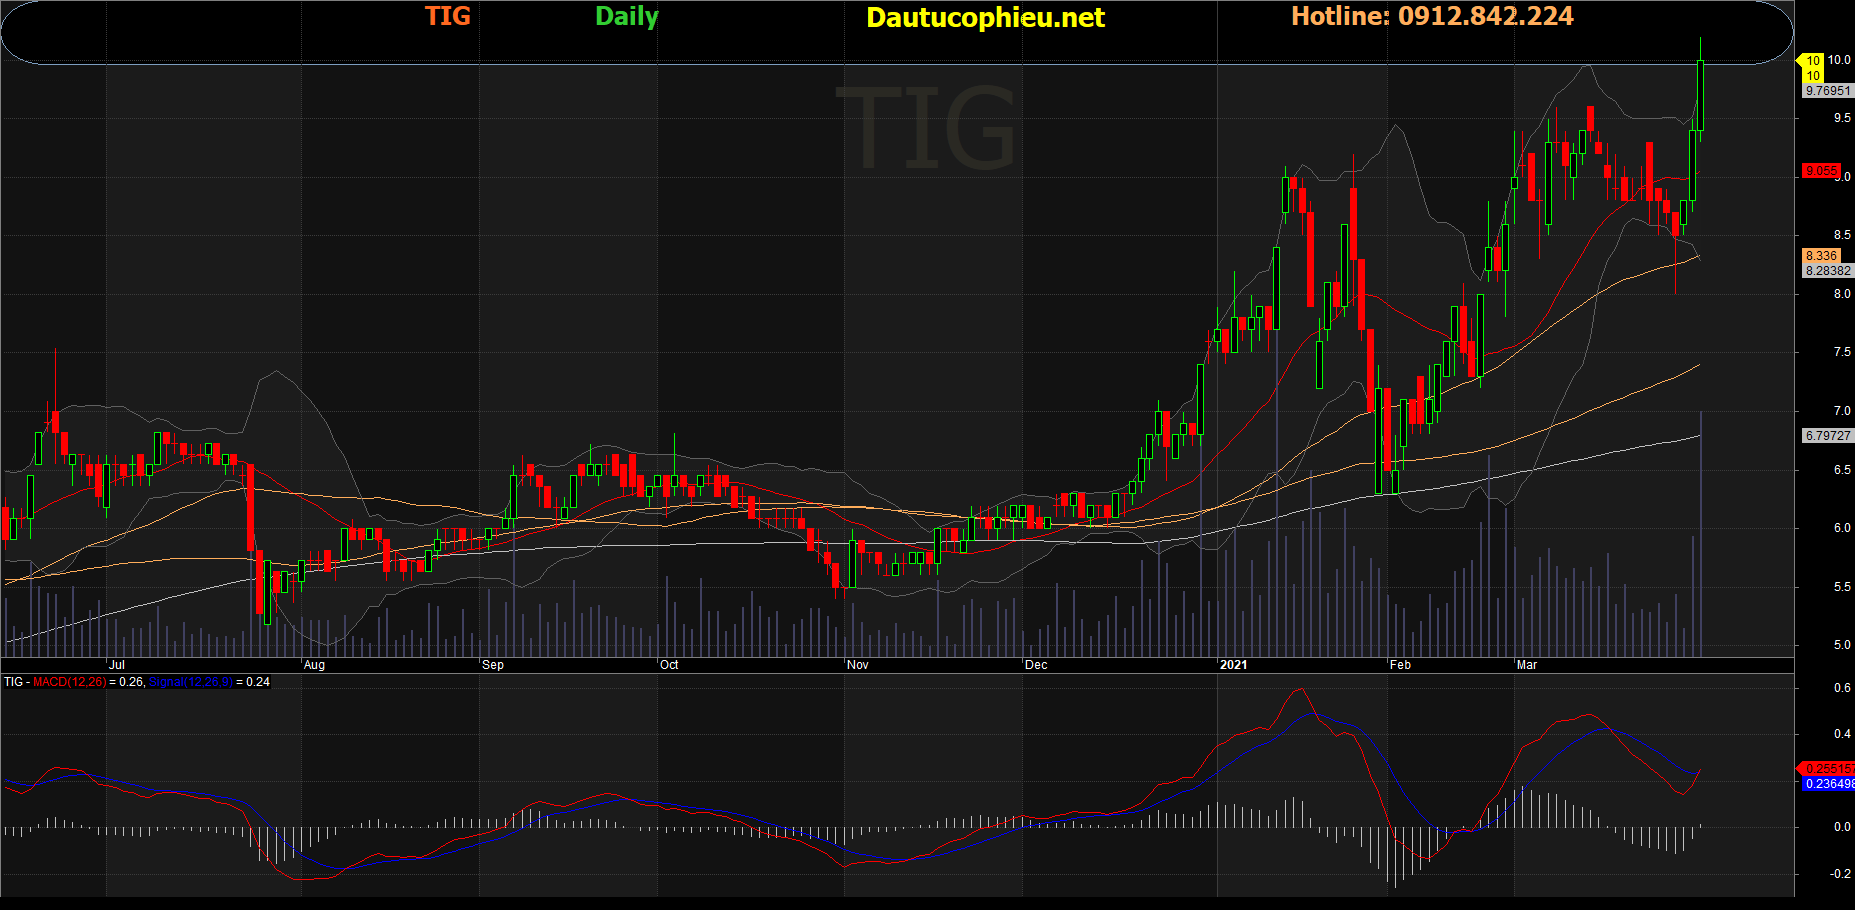 Cổ phiếu TIG